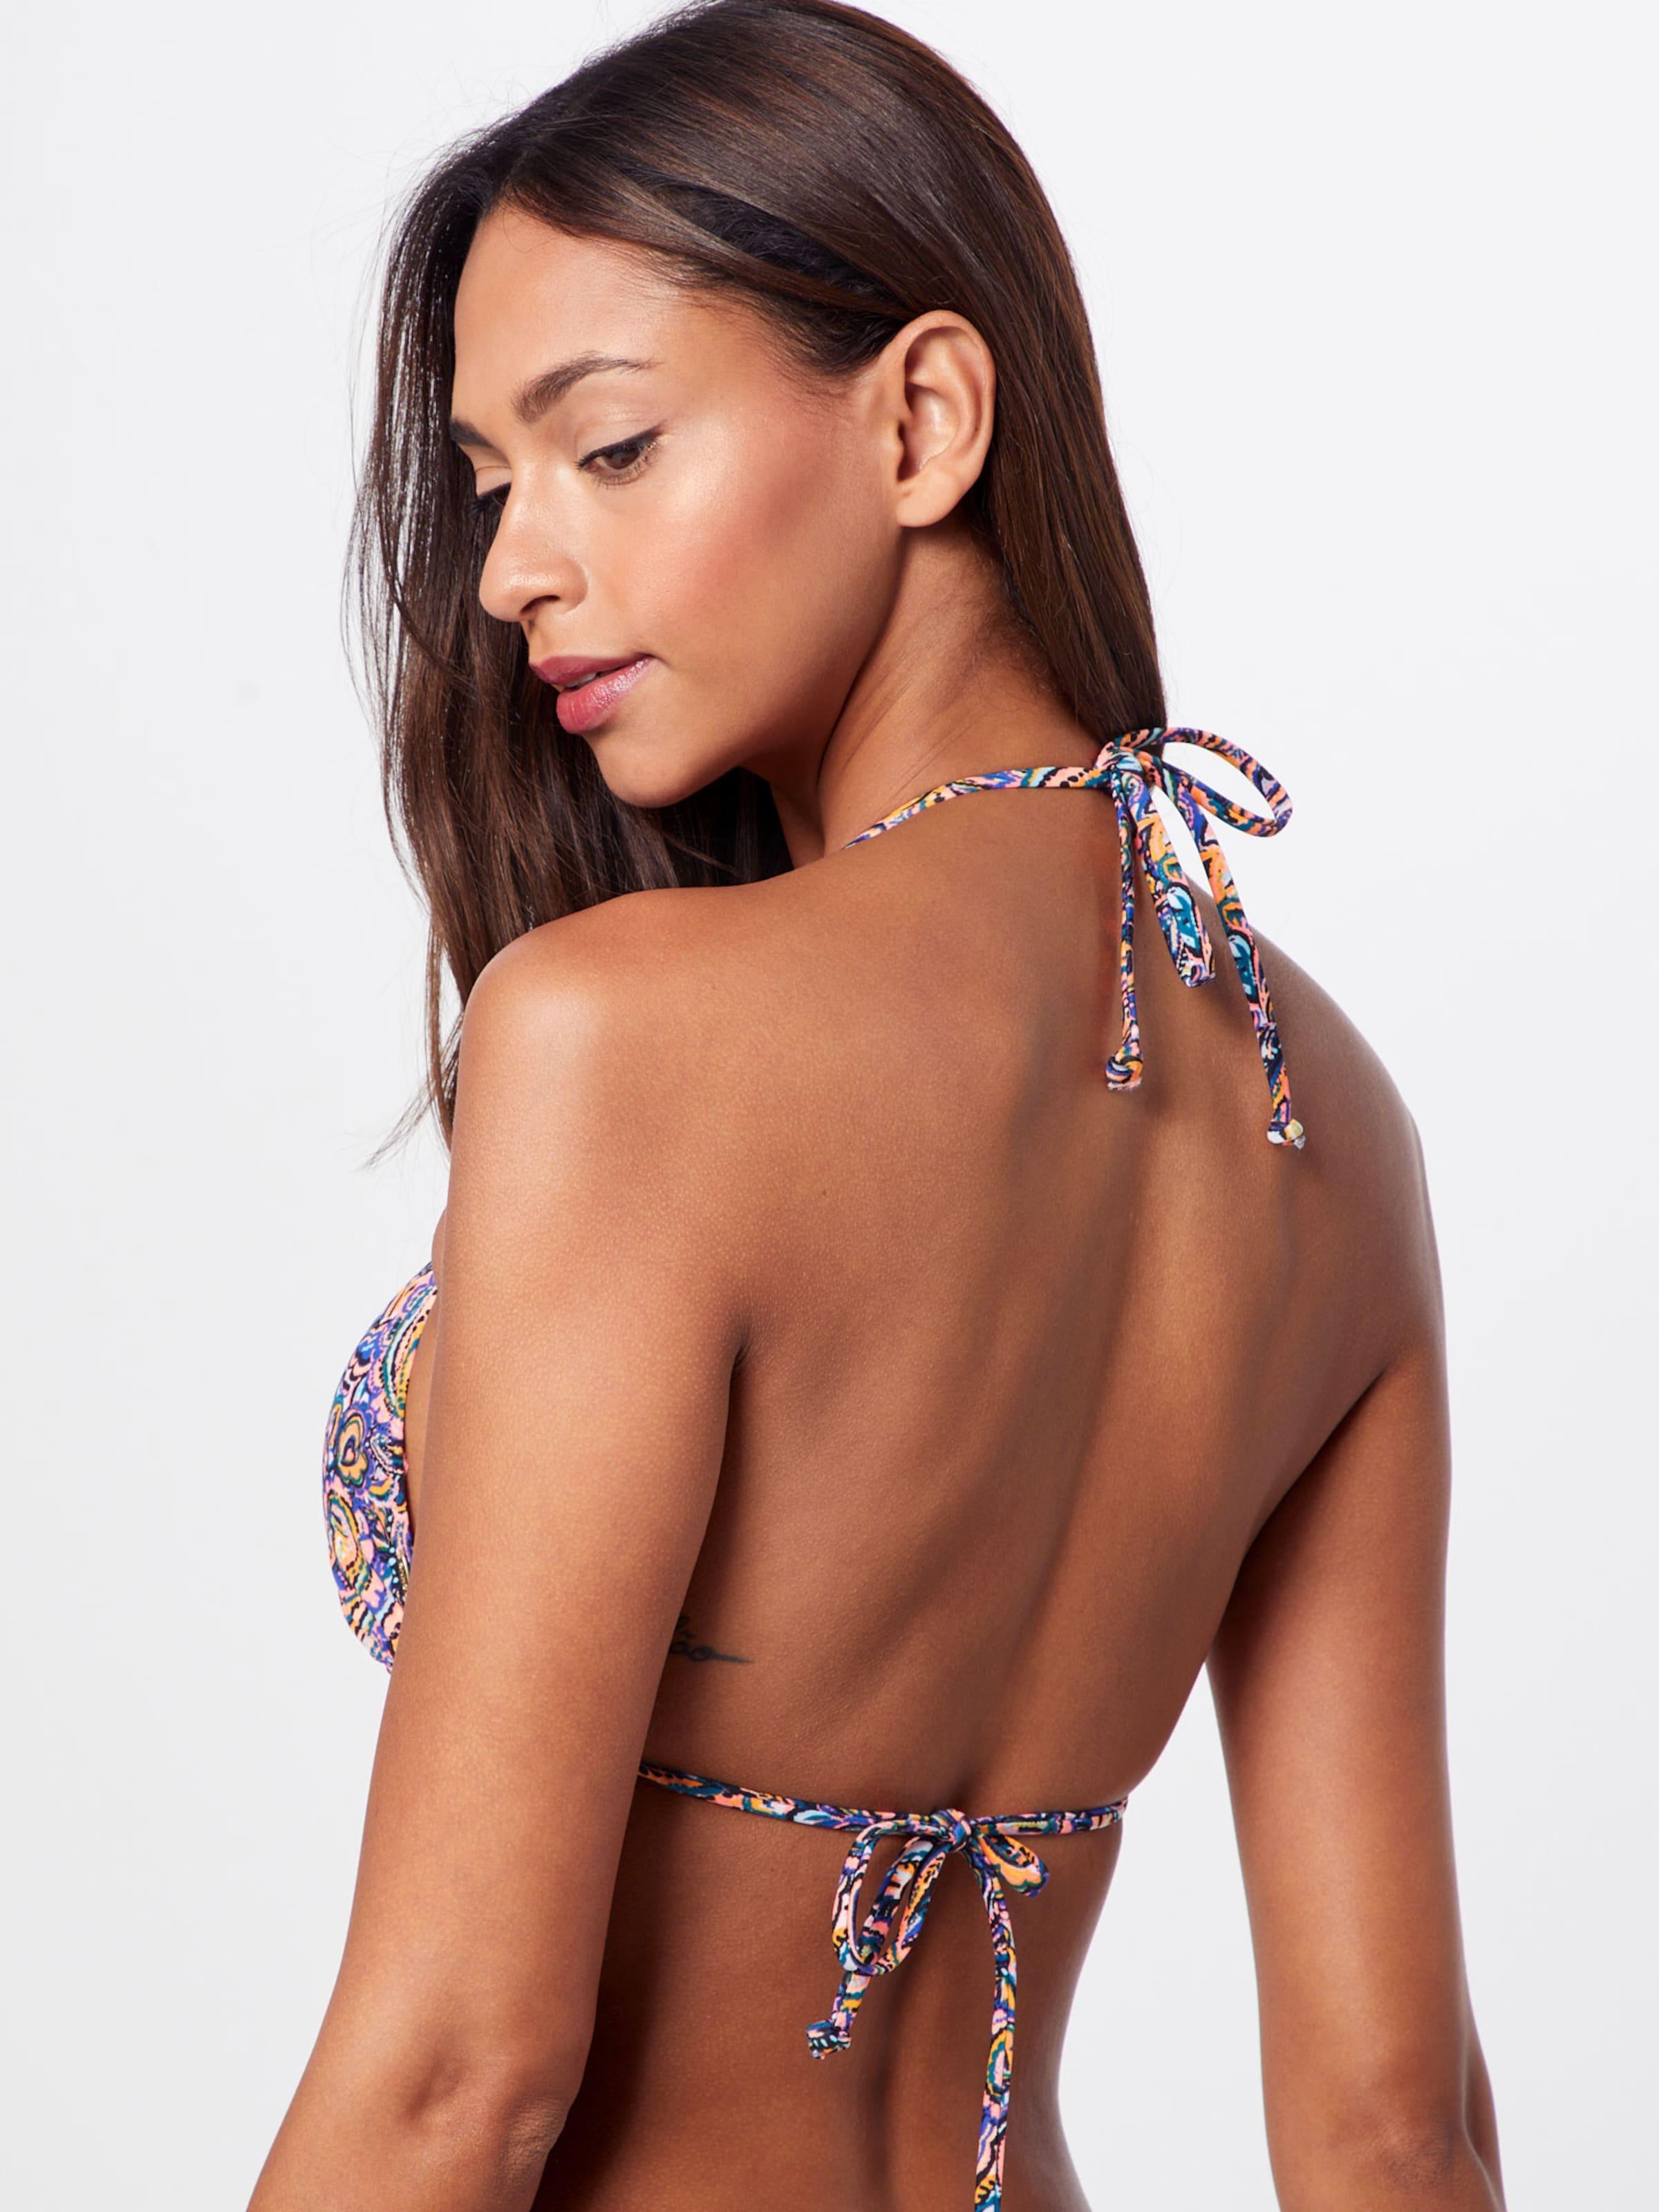 De Hauts En 'gypsy' Bikini Mélange Skiny Couleurs LzMSUpqVG